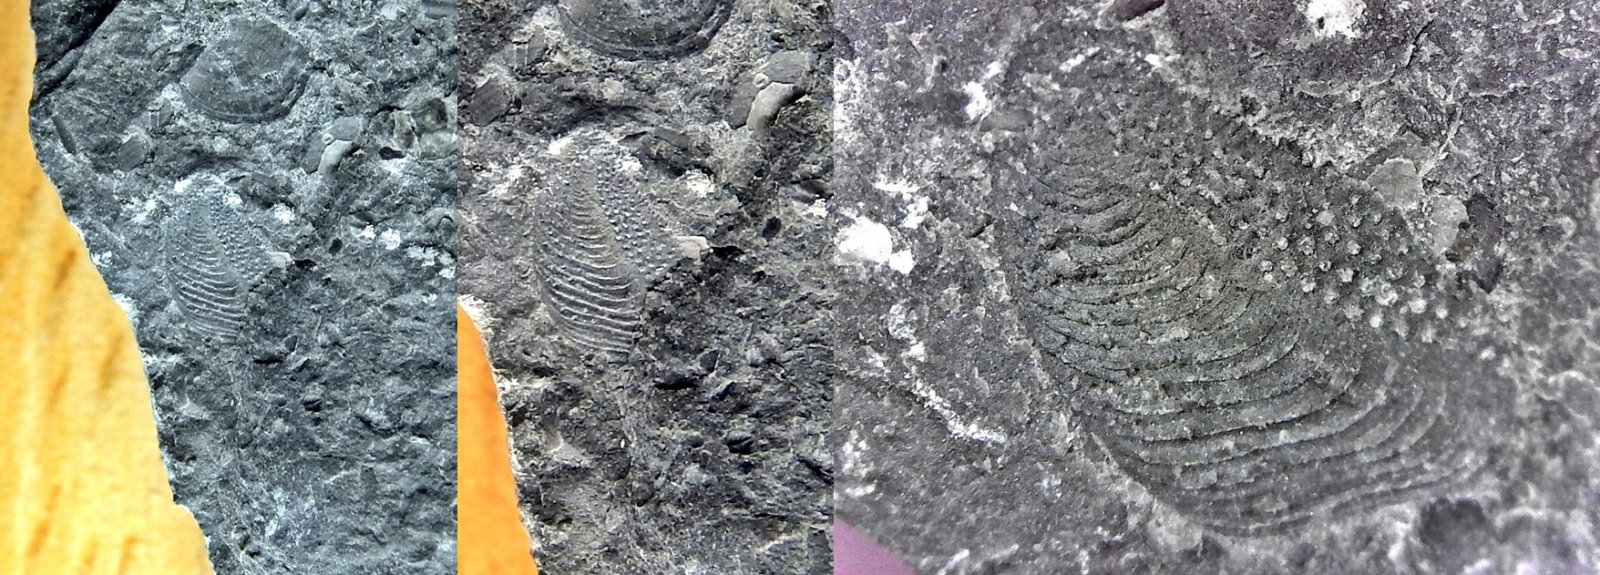 Turrilepas nitidulus - armored worm plate